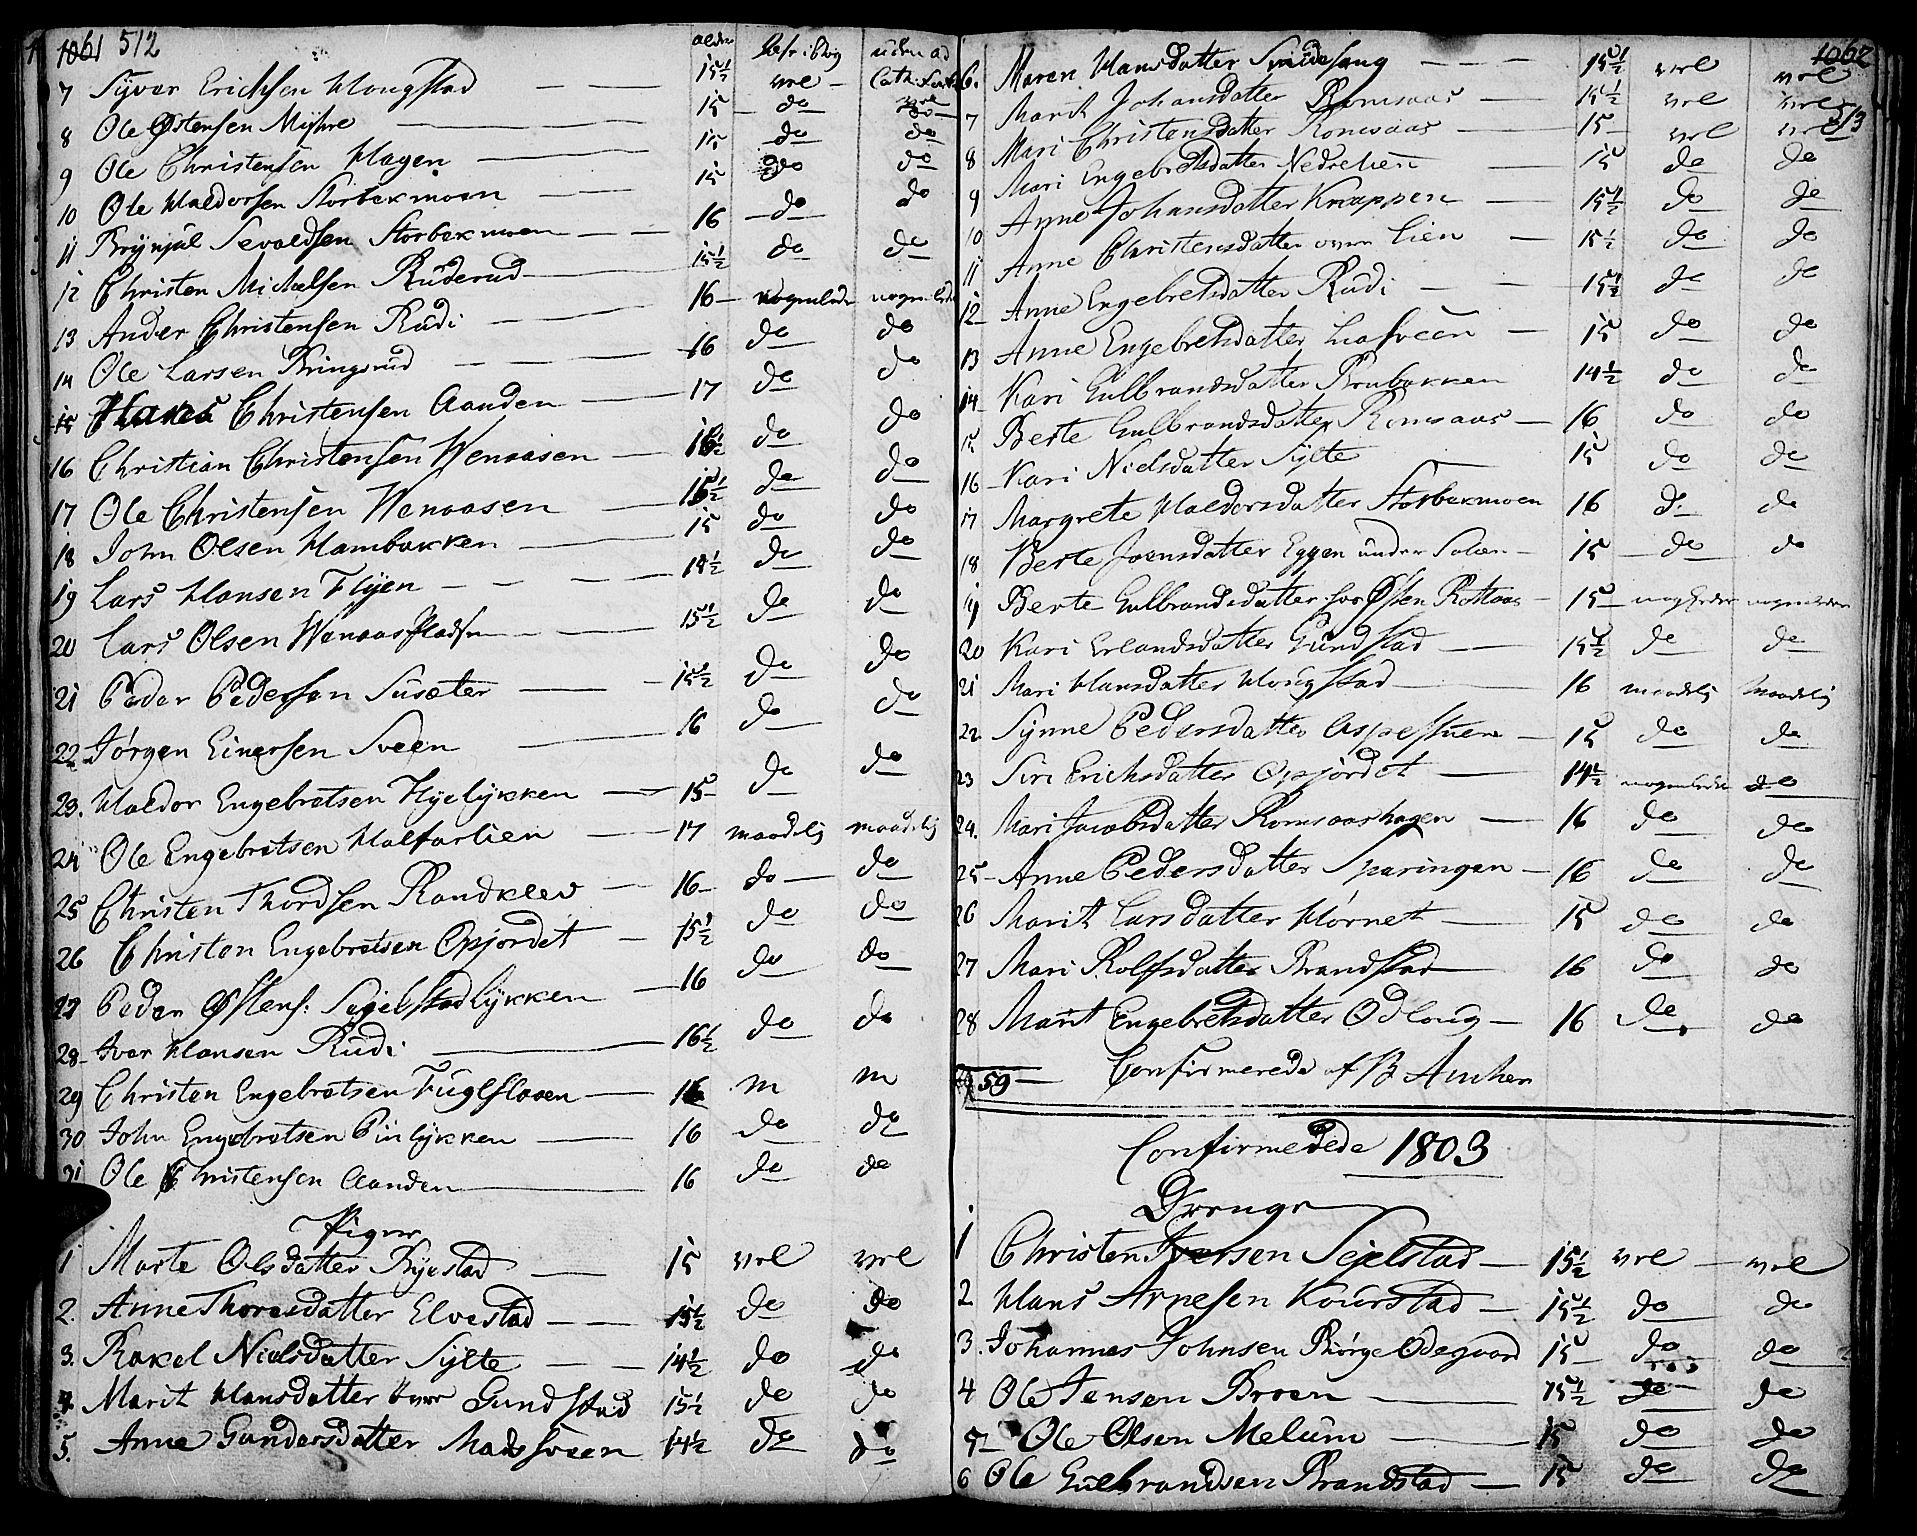 SAH, Ringebu prestekontor, Ministerialbok nr. 3, 1781-1820, s. 512-513